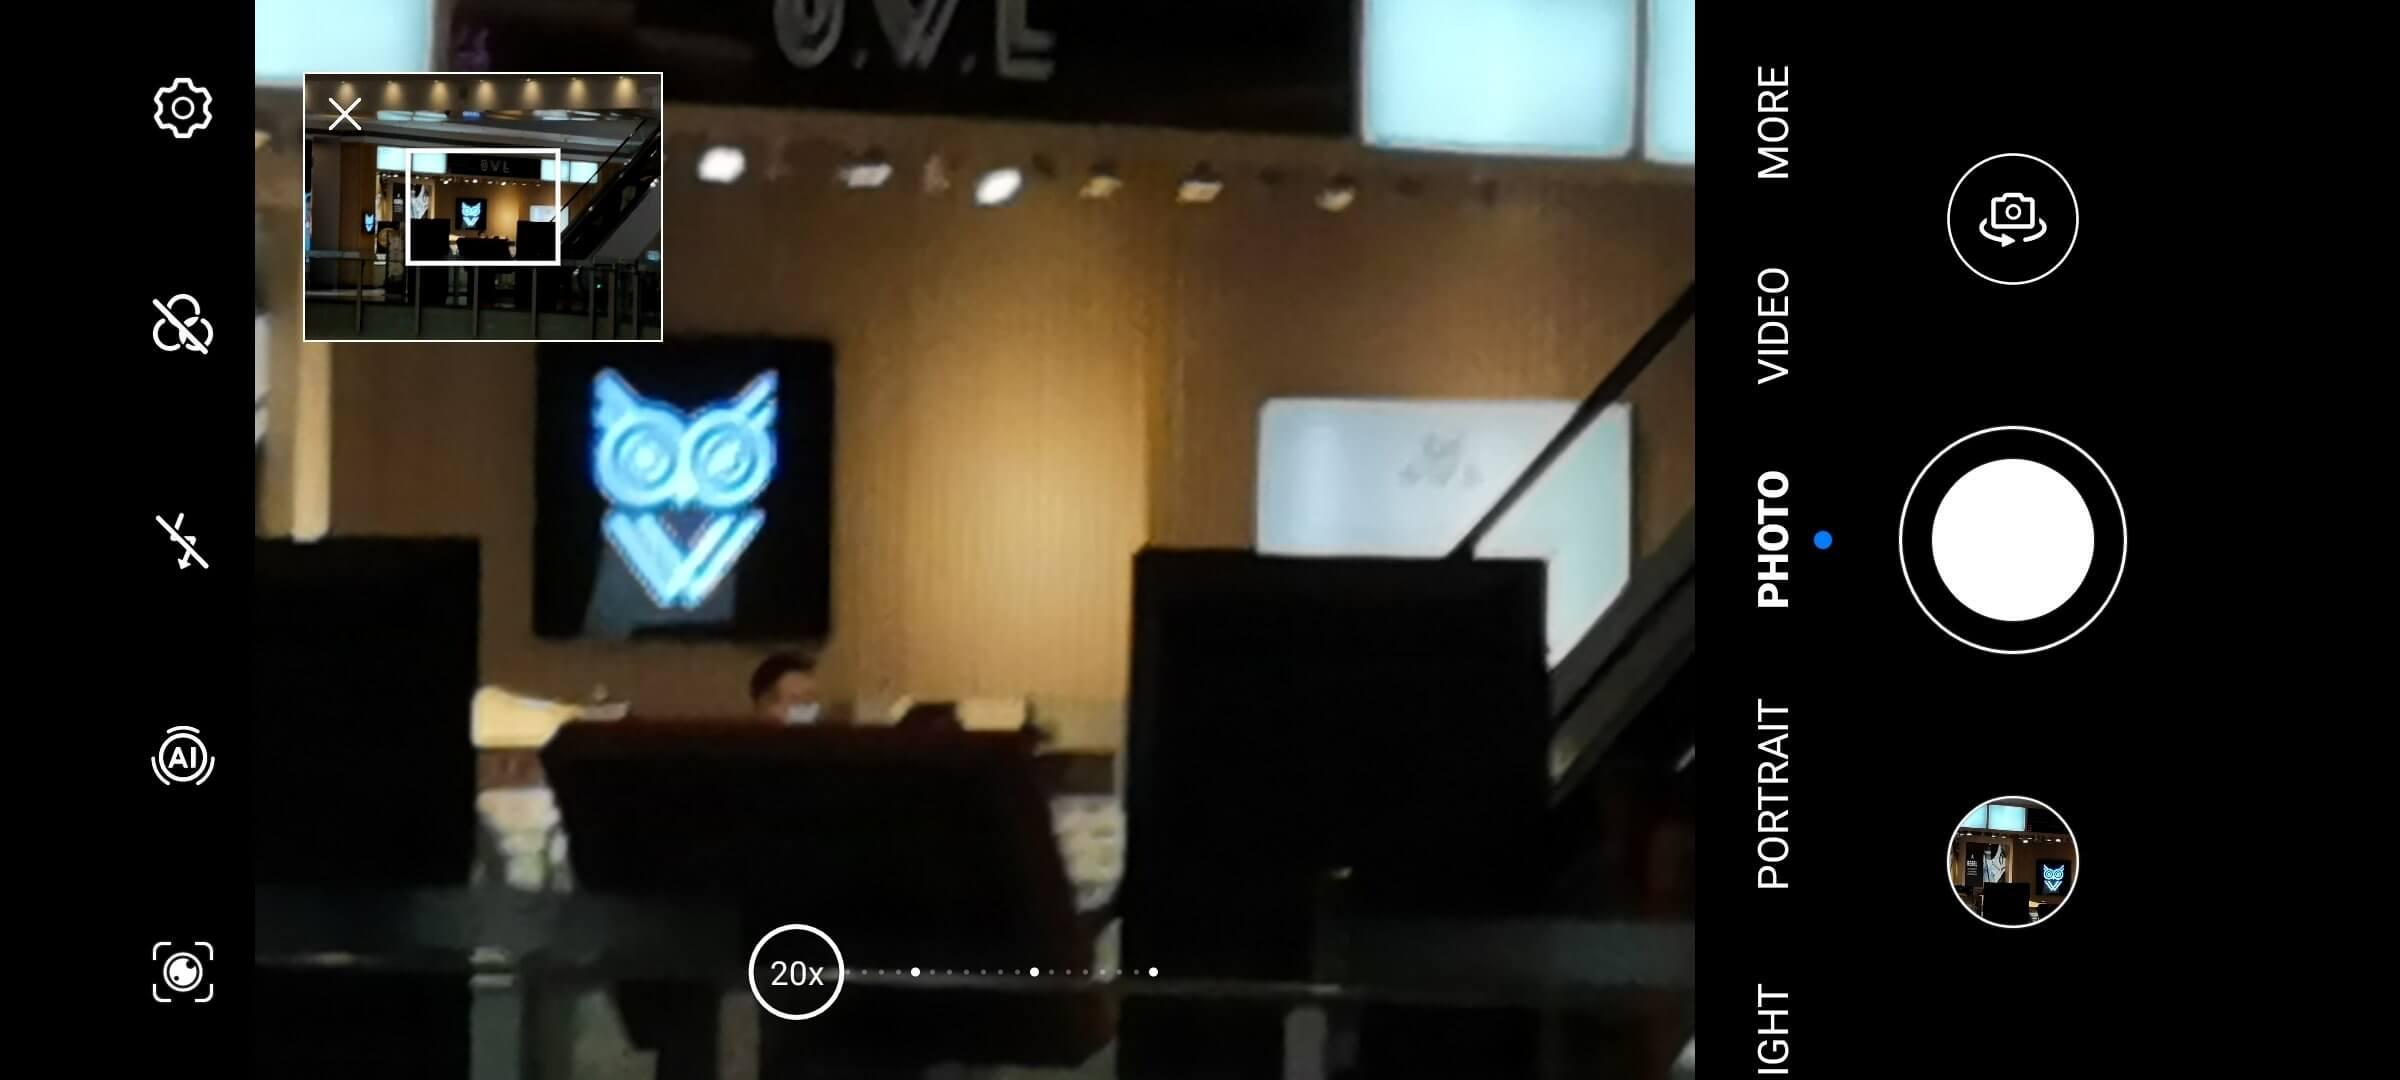 Huawei camera EMUI pro mode